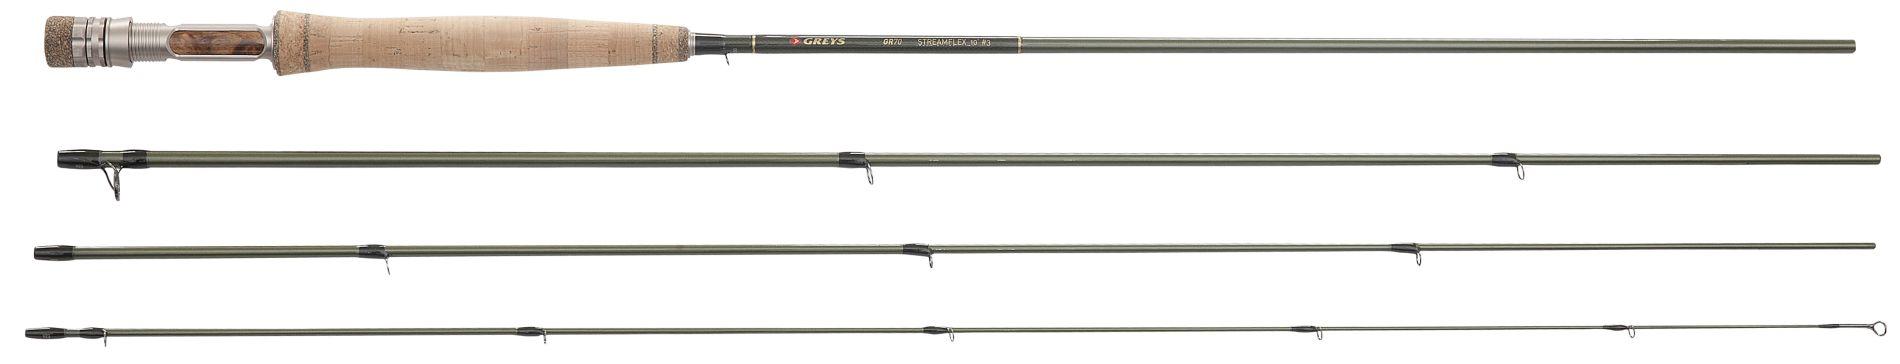 GREYS Muškařský prut Greys GR70 Streamflex 2,74m #3